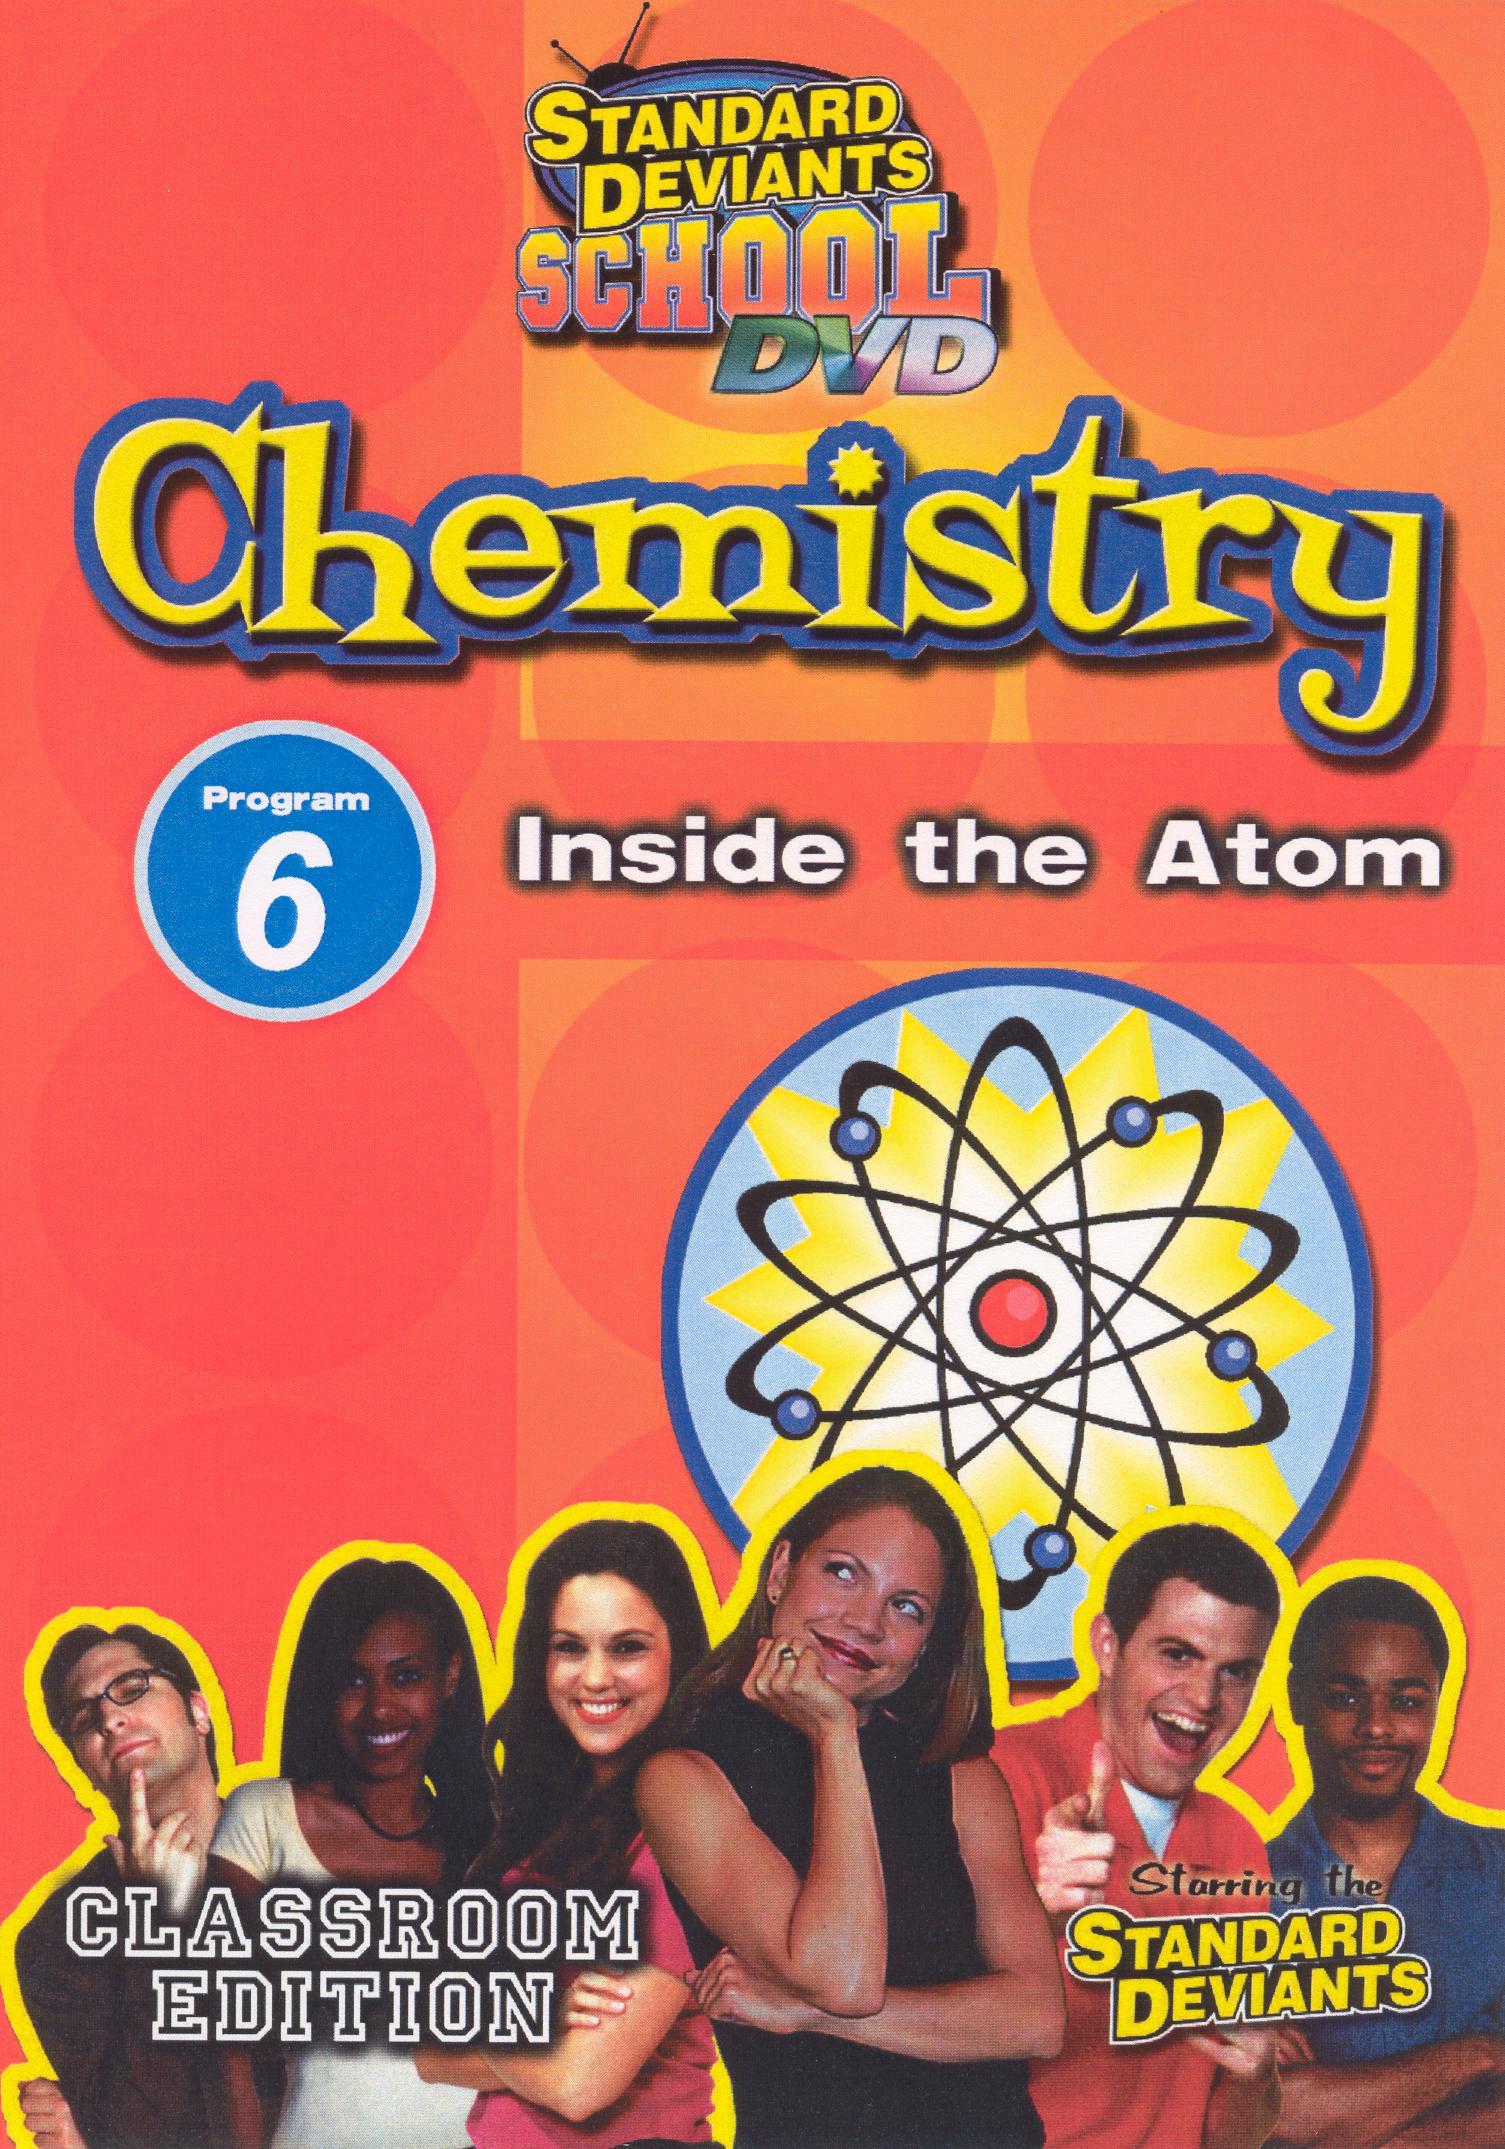 Standard Deviants School: Chemistry, Program 6